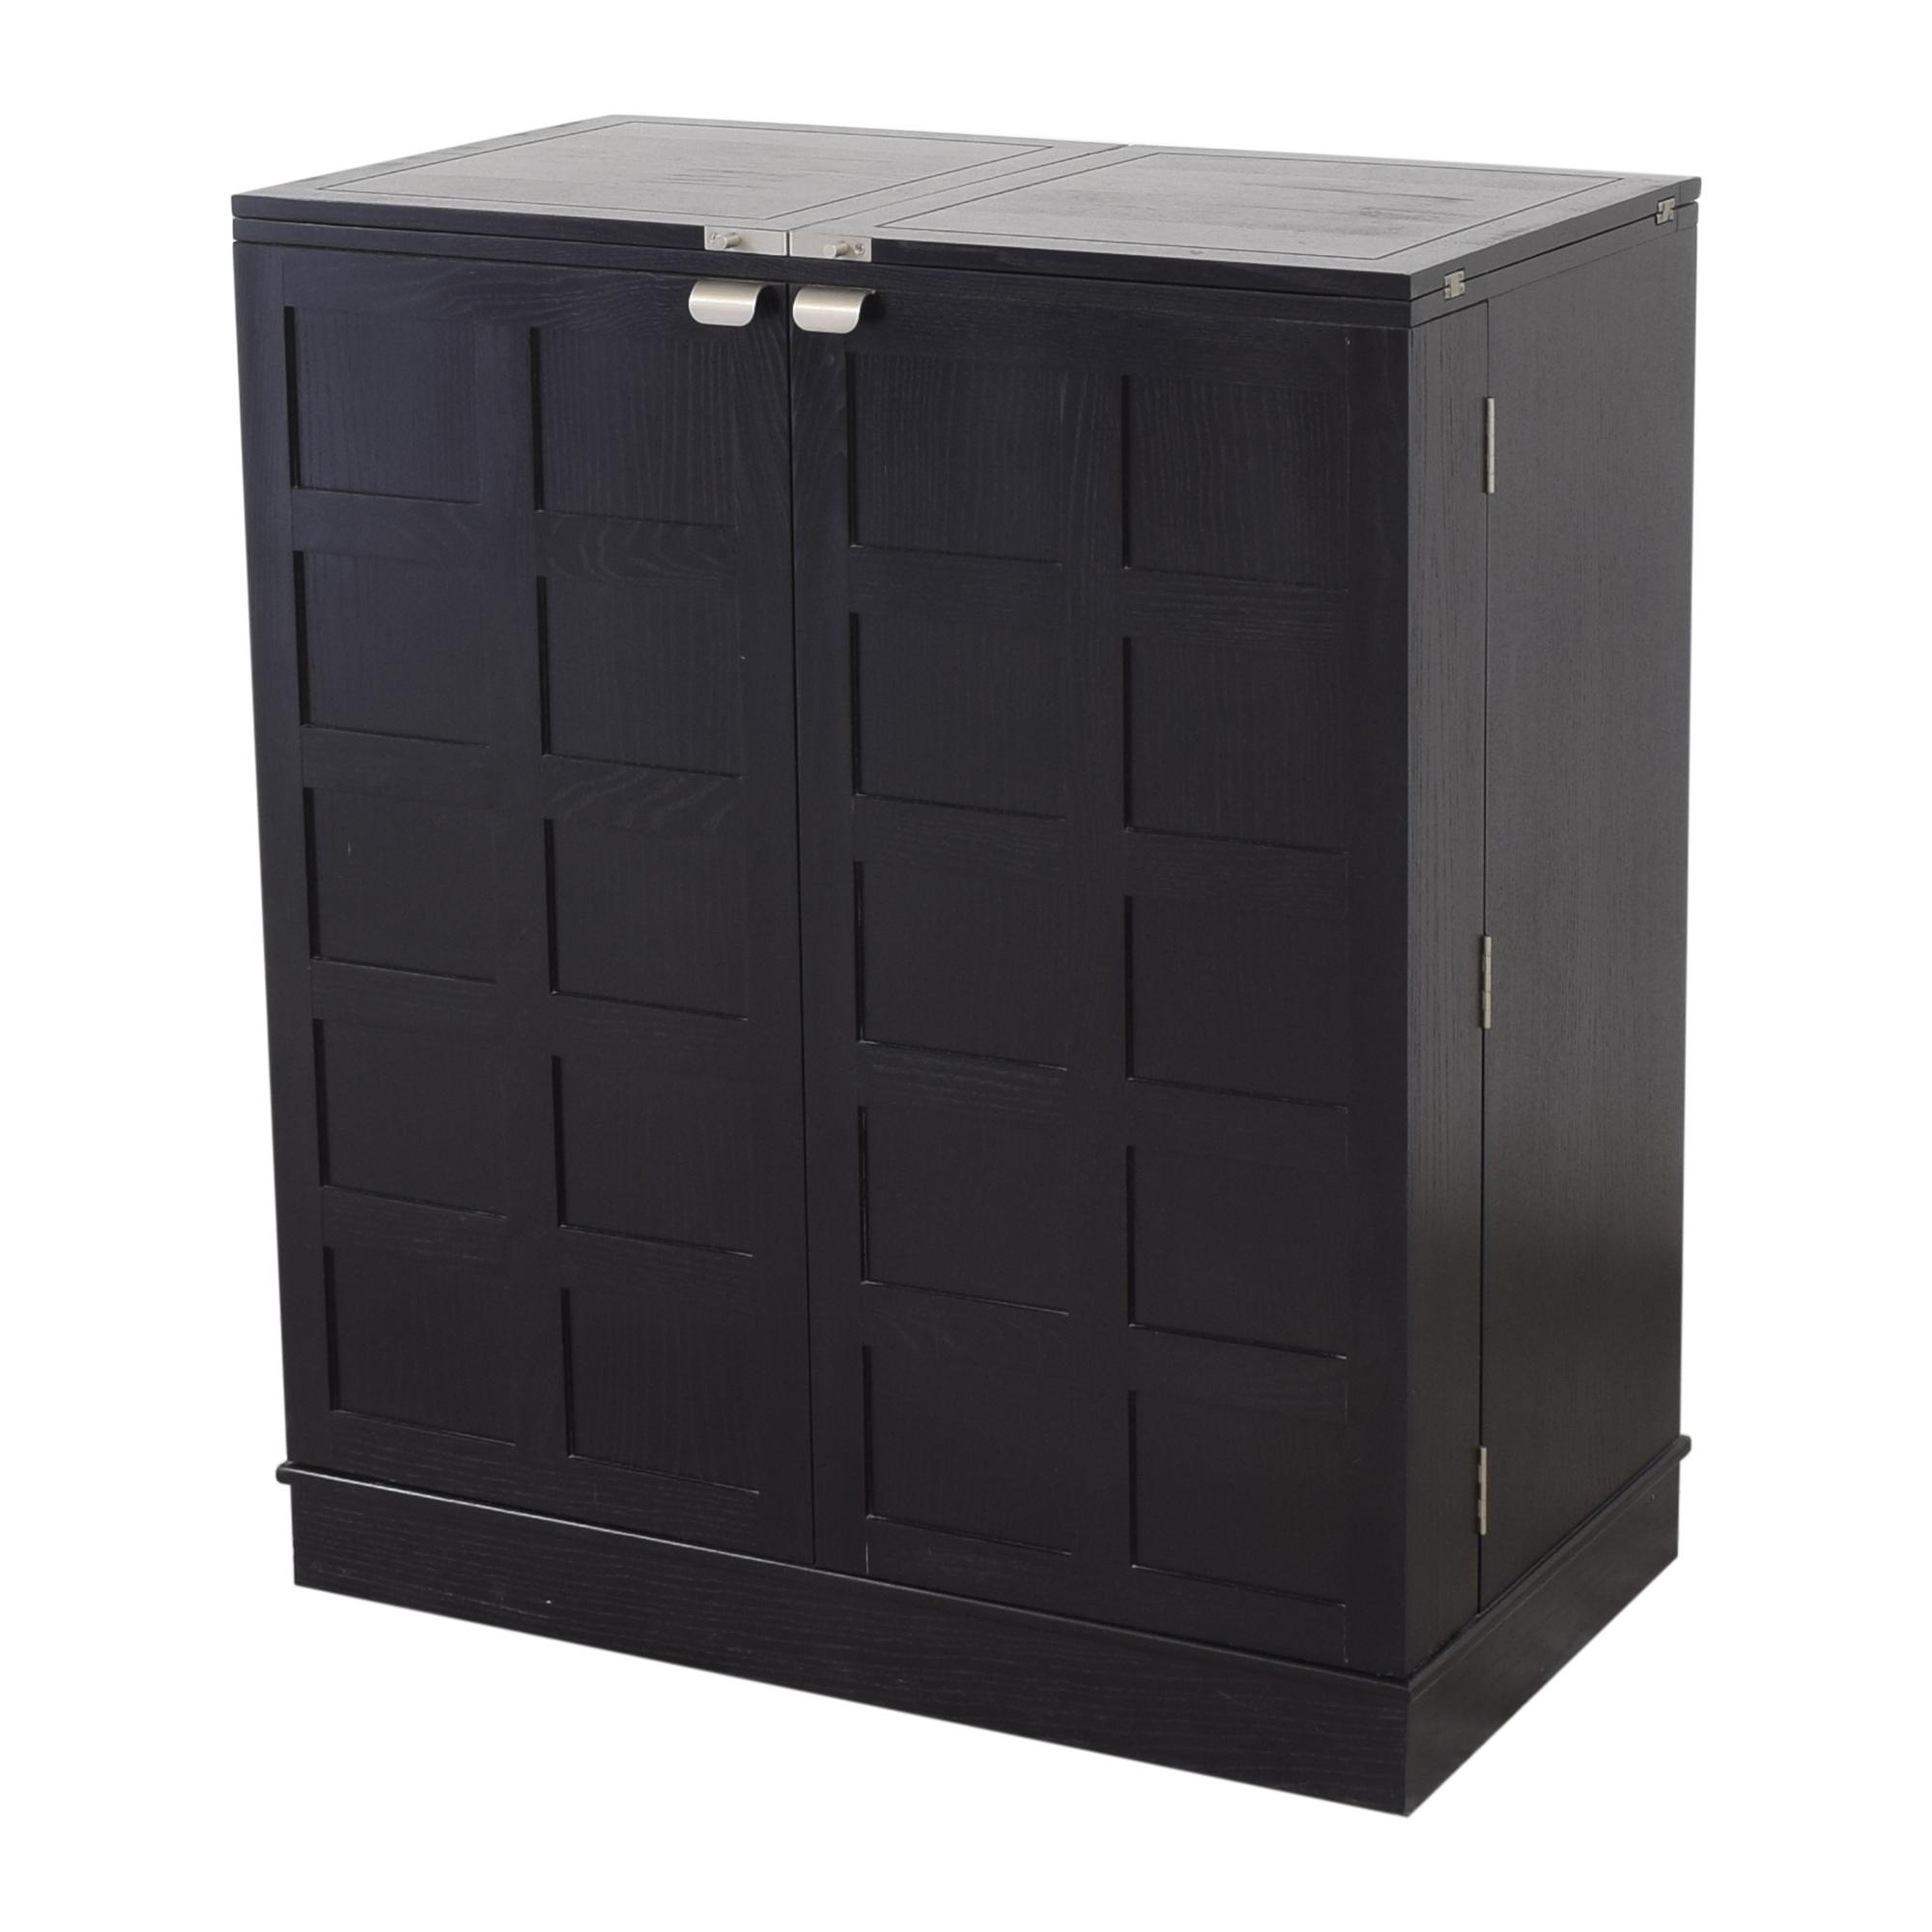 Crate & Barrel Crate & Barrel Steamer Bar Cabinet ct